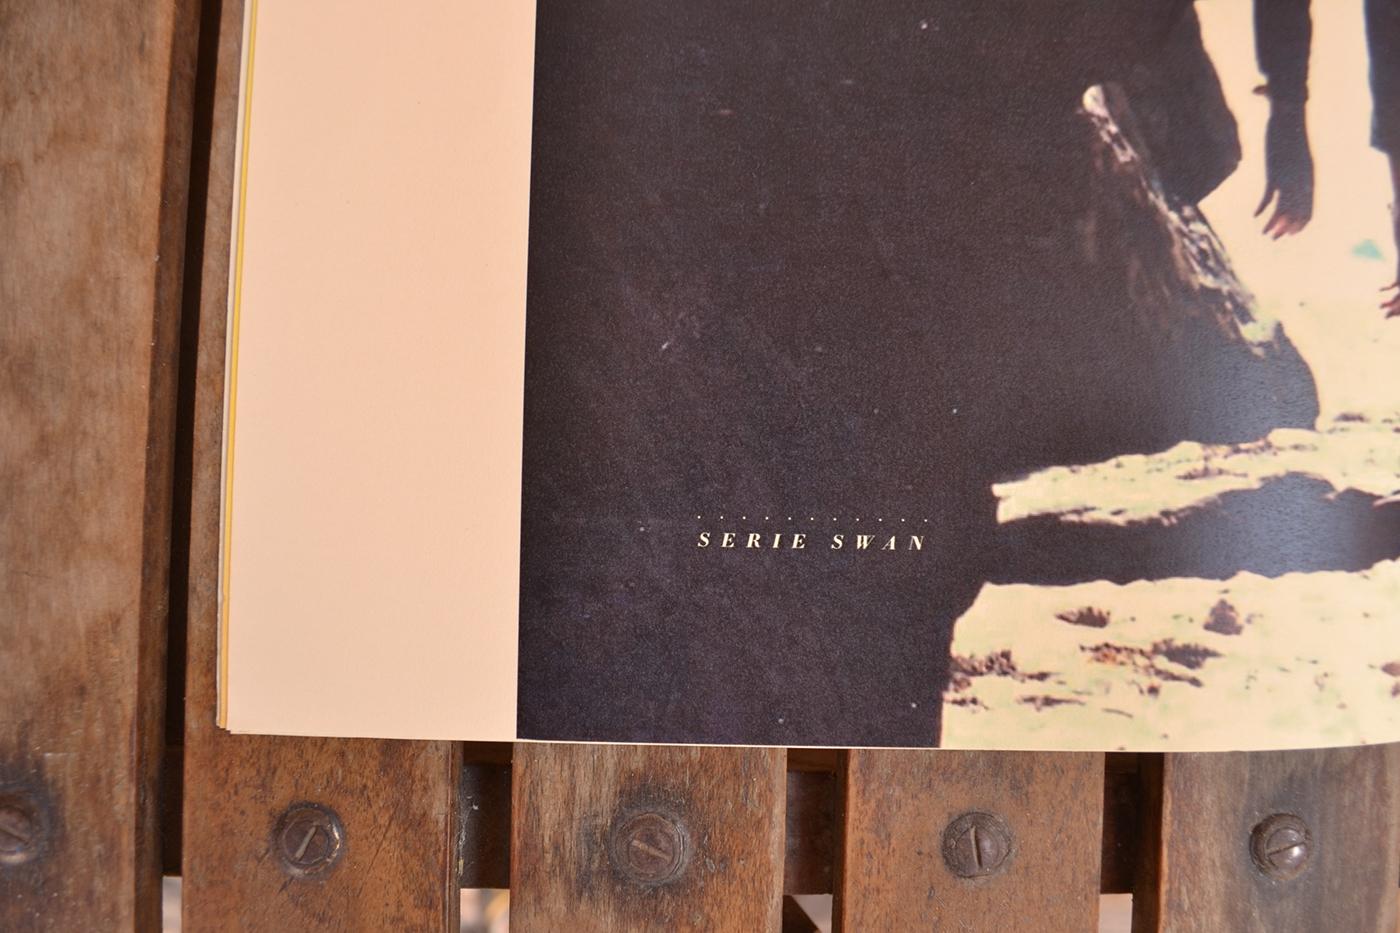 revista alt cosgaya editorial magazine mag fadu uba rock musica indie